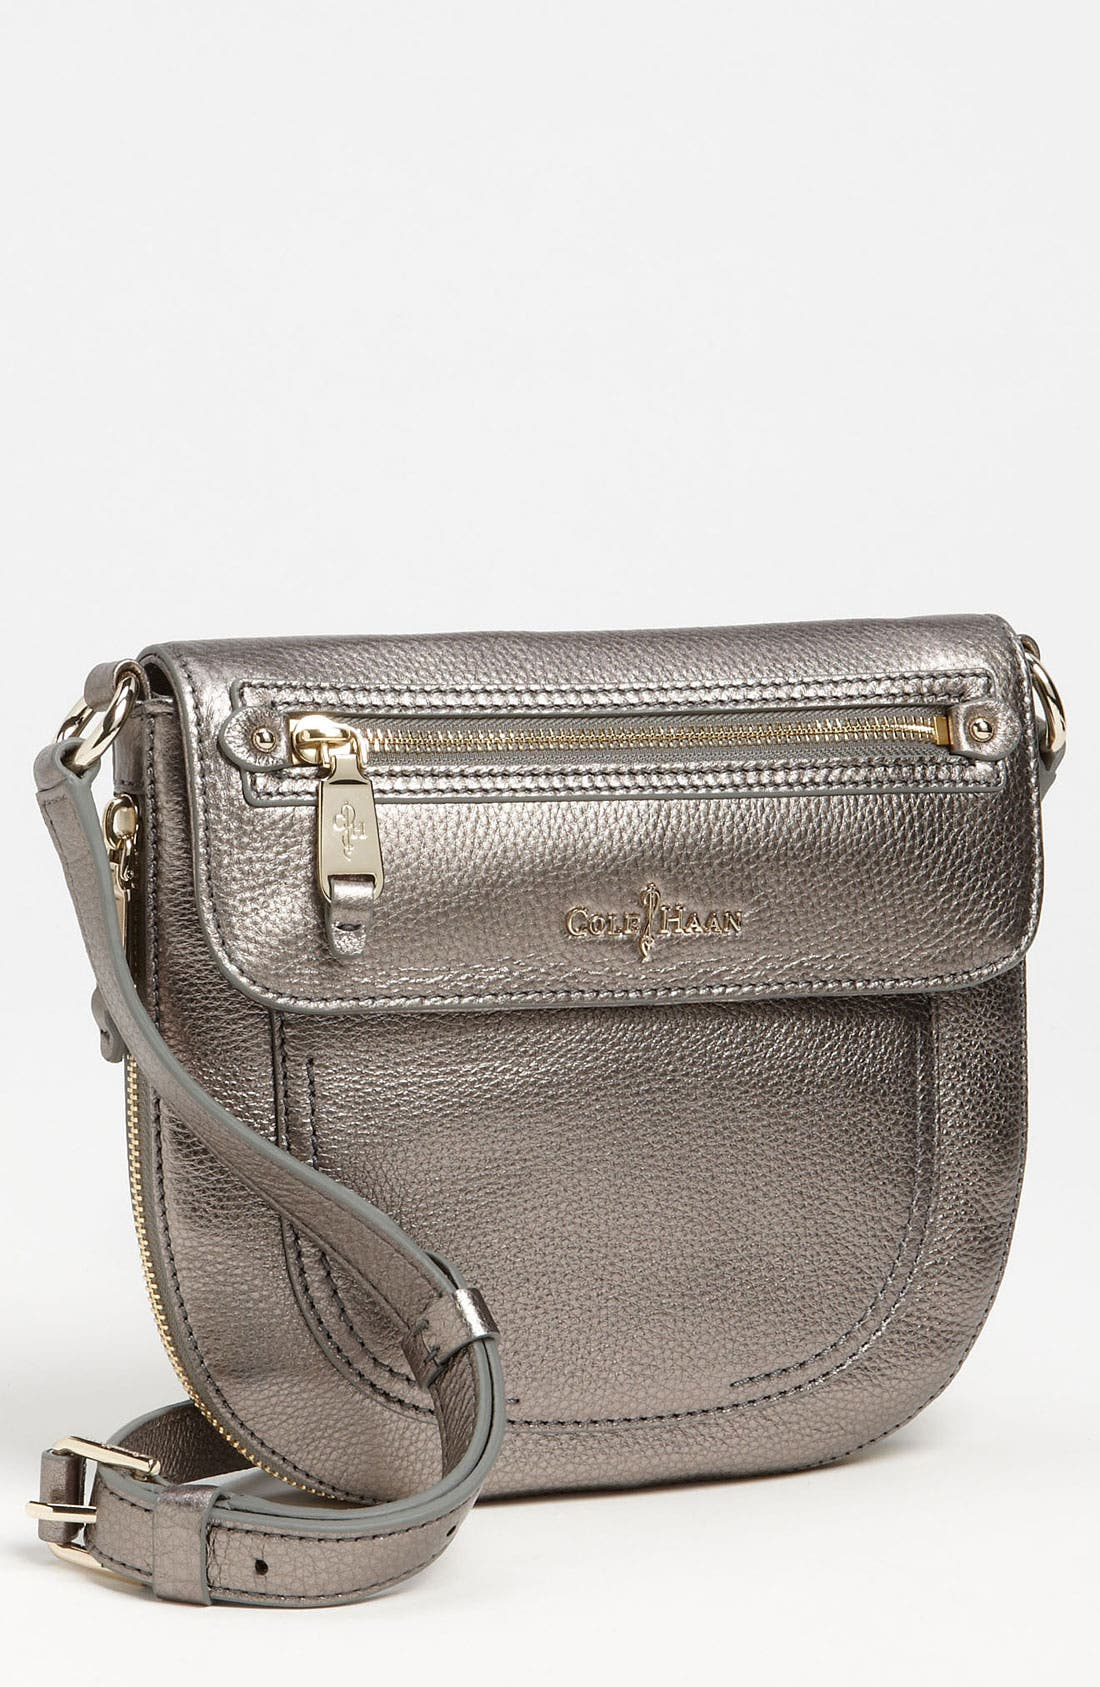 Main Image - Cole Haan 'Linley - Canteen' Crossbody Bag